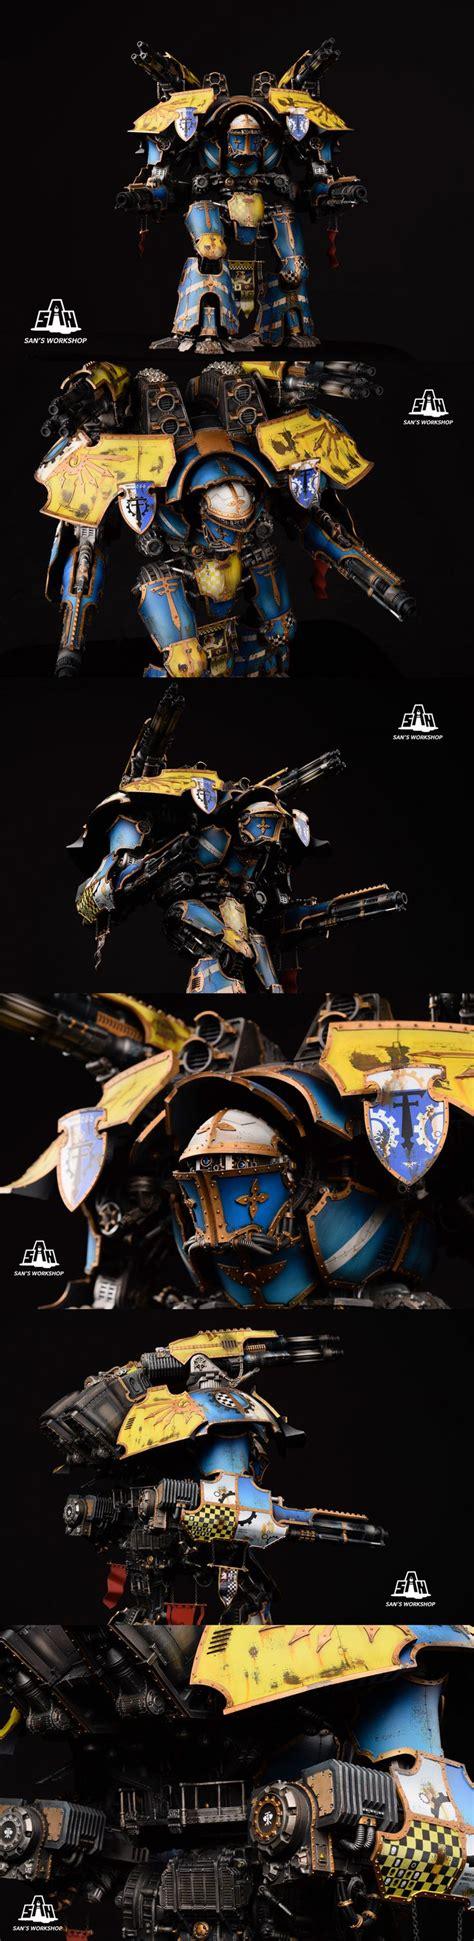 repository pattern overkill mars alpha pattern warlord titan warhammer 40k aos